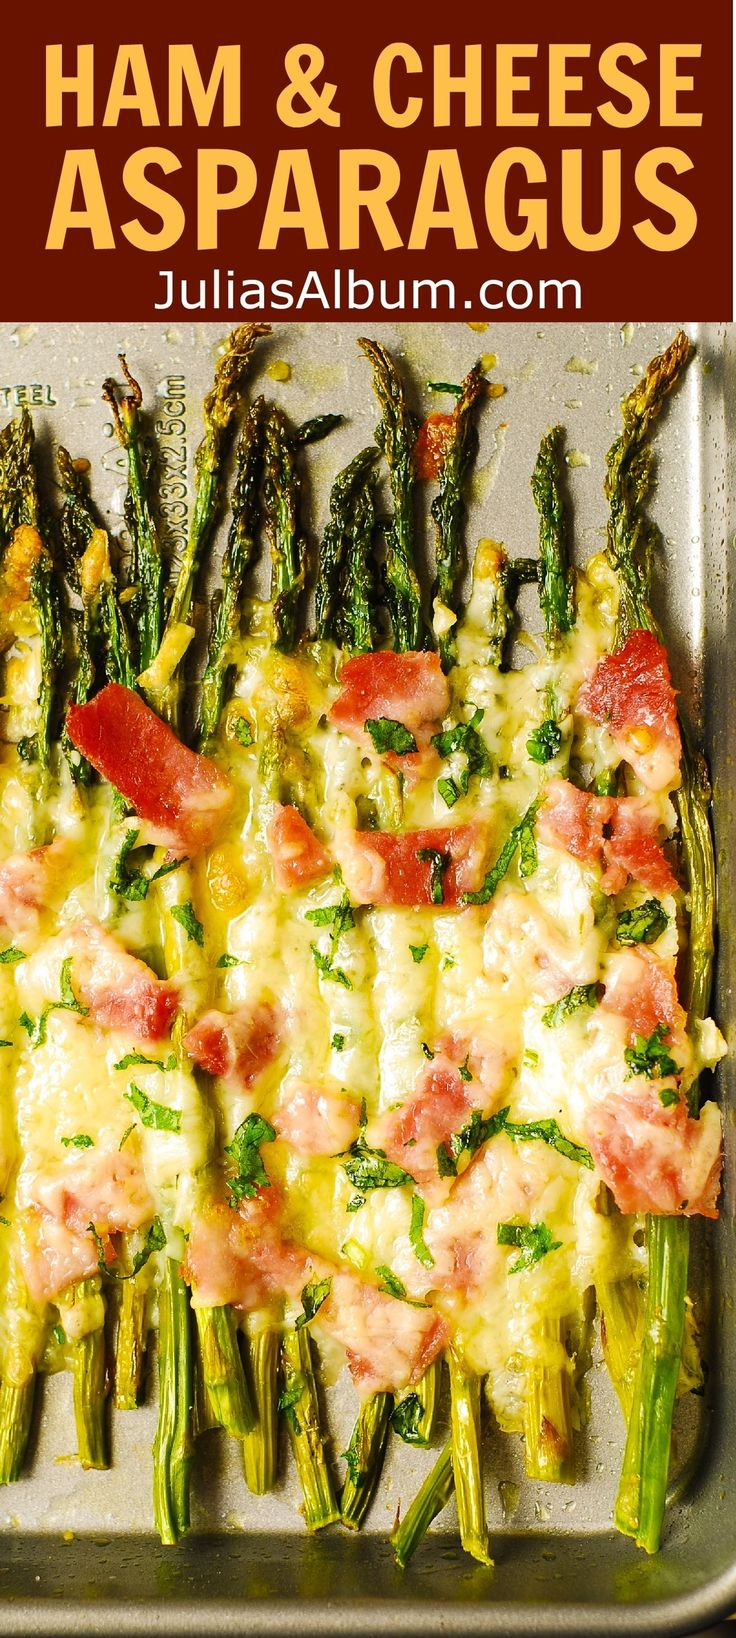 Best 25+ Ham side dishes ideas on Pinterest | Pasta salad recipes ...